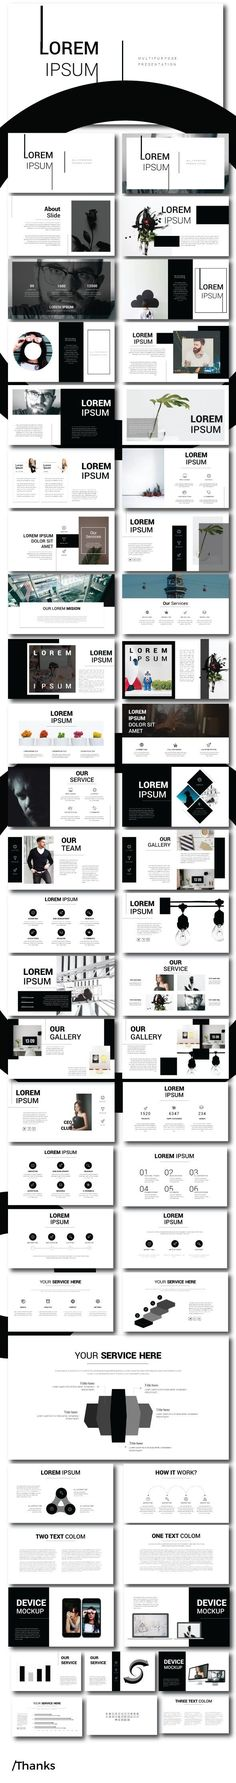 Lorem Ipsum - Powerpoint - Business PowerPoint Templates